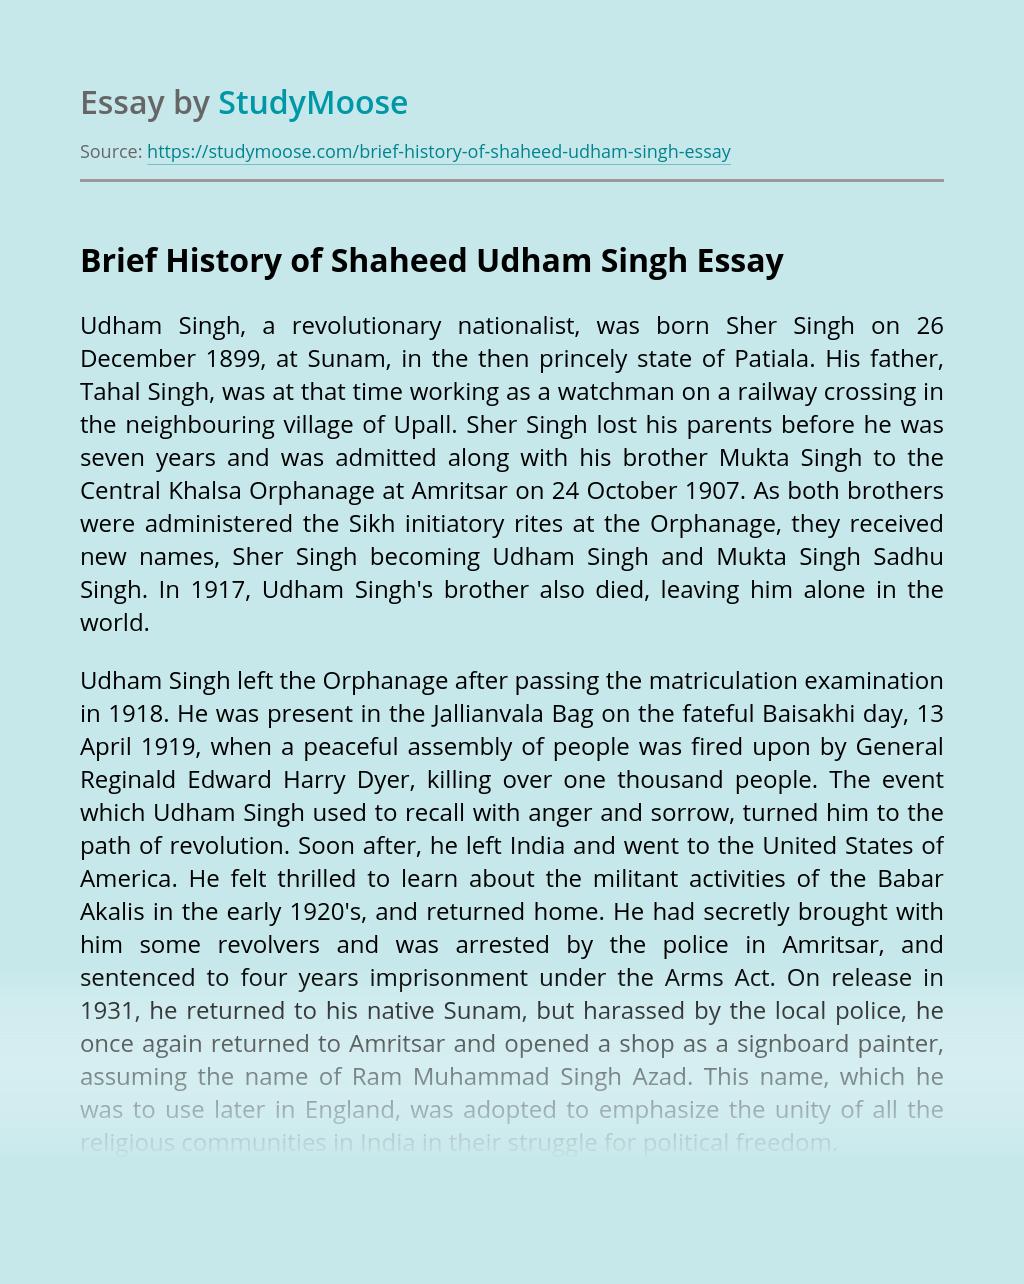 Brief History of Shaheed Udham Singh